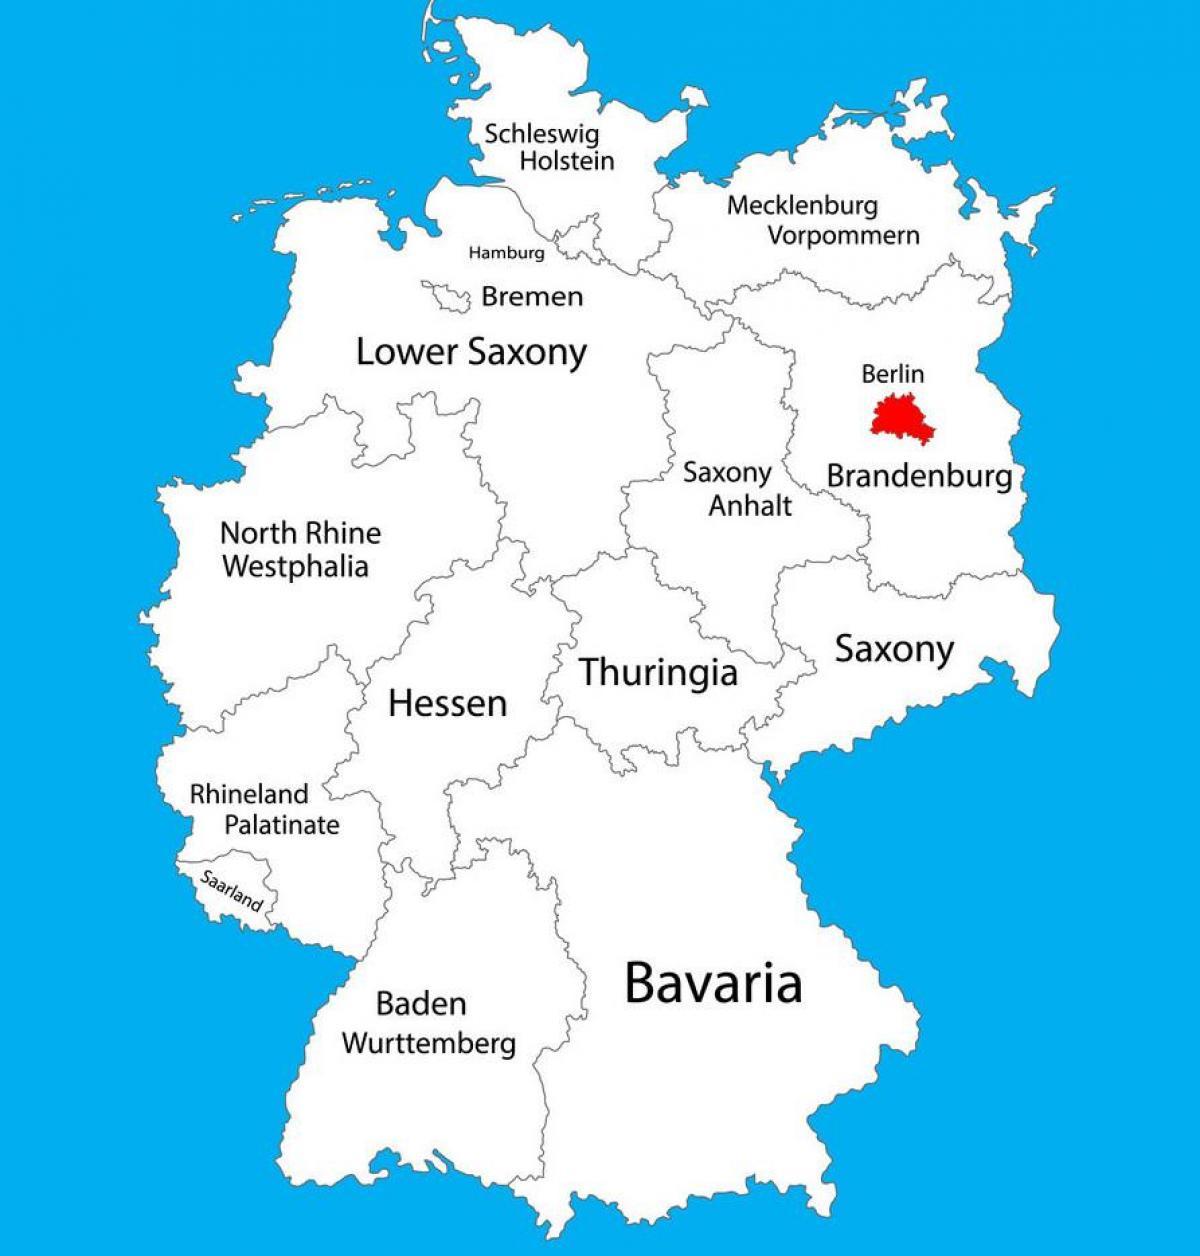 Karte Bamberg Landkarte.Berlin Deutschland Landkarte Karte Von Deutschland Zeigt